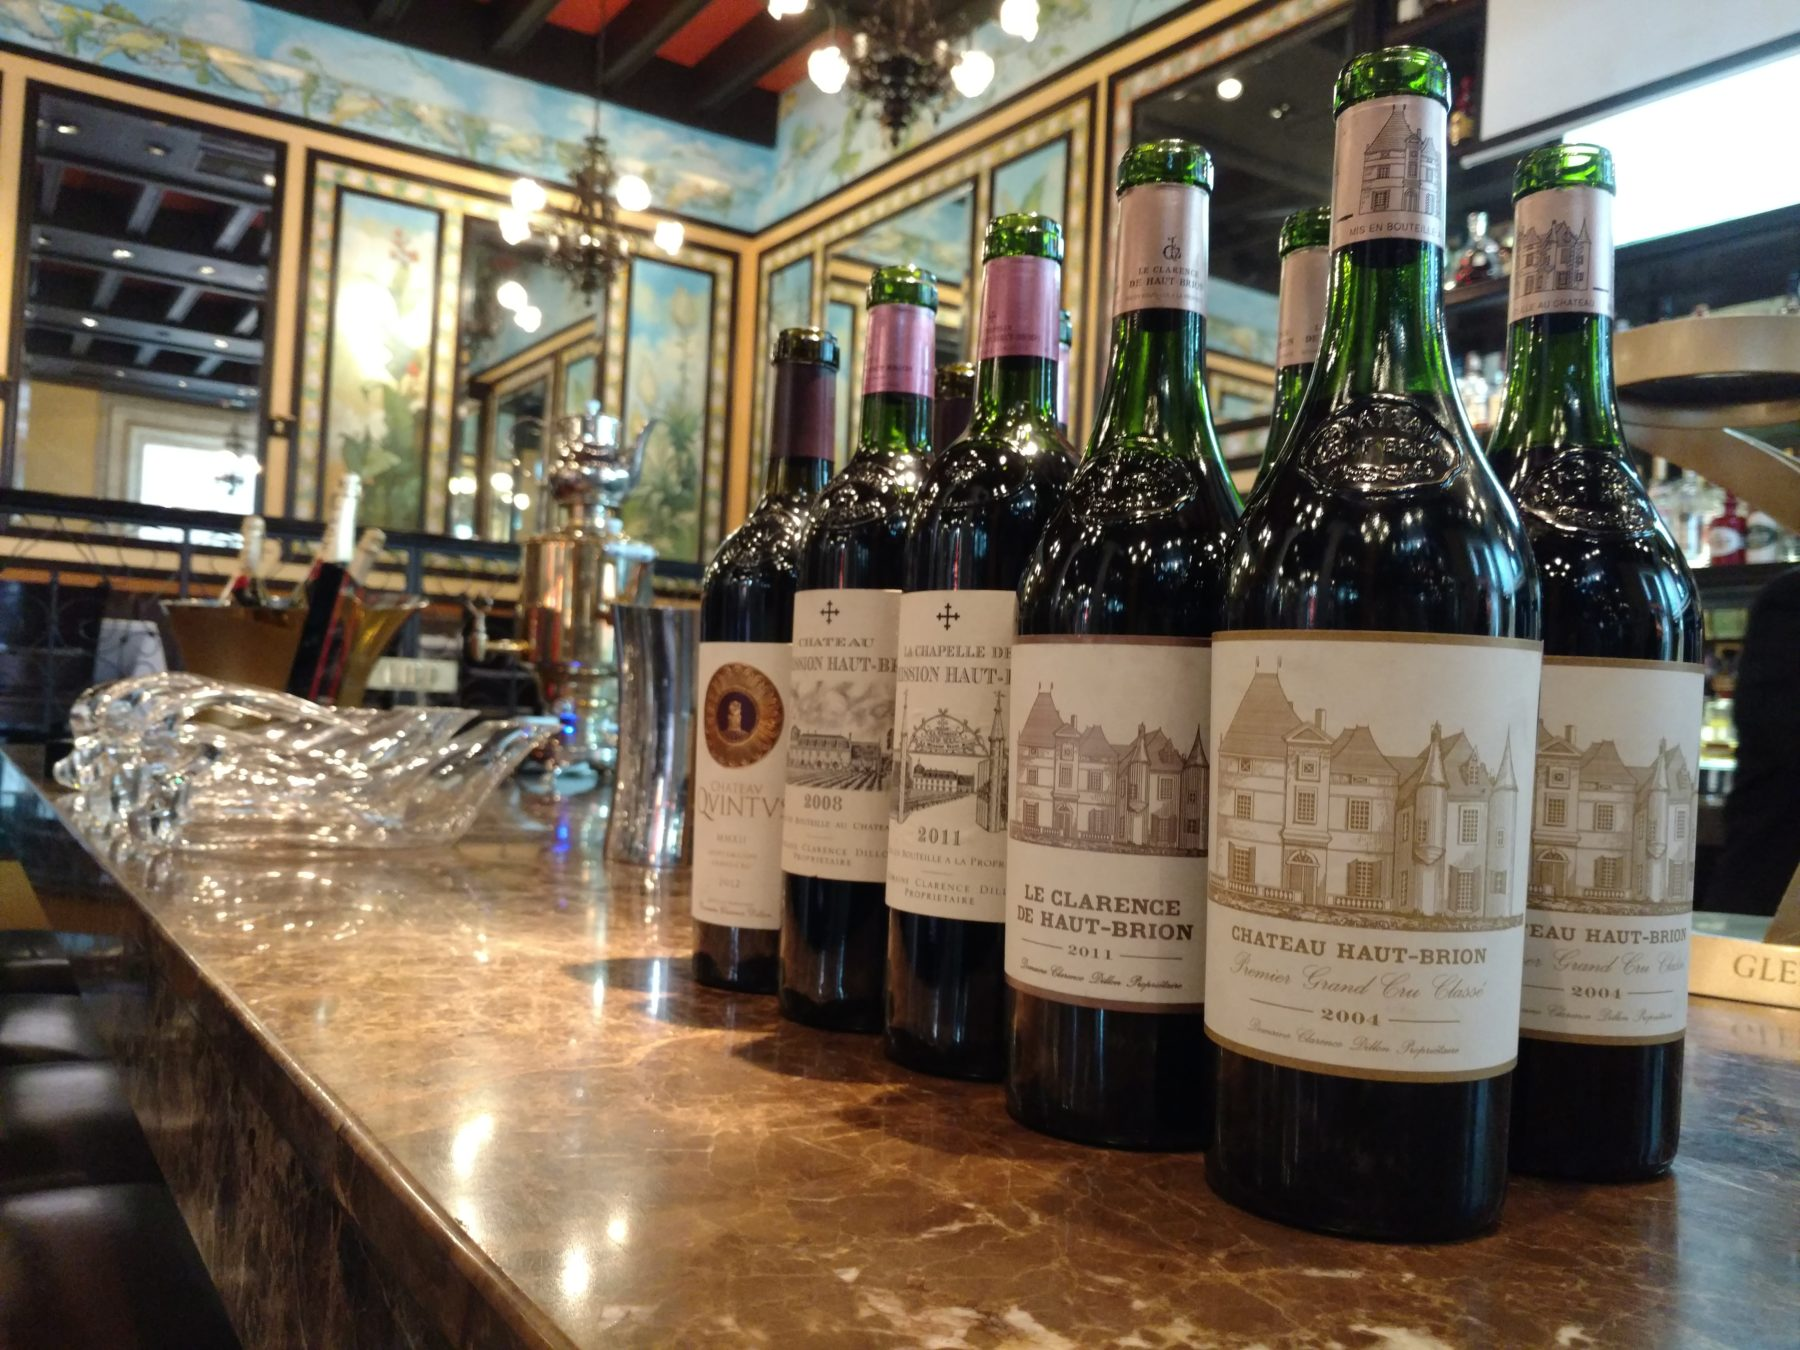 5 grandes Châteaux degustados en LIPP La Brasserie